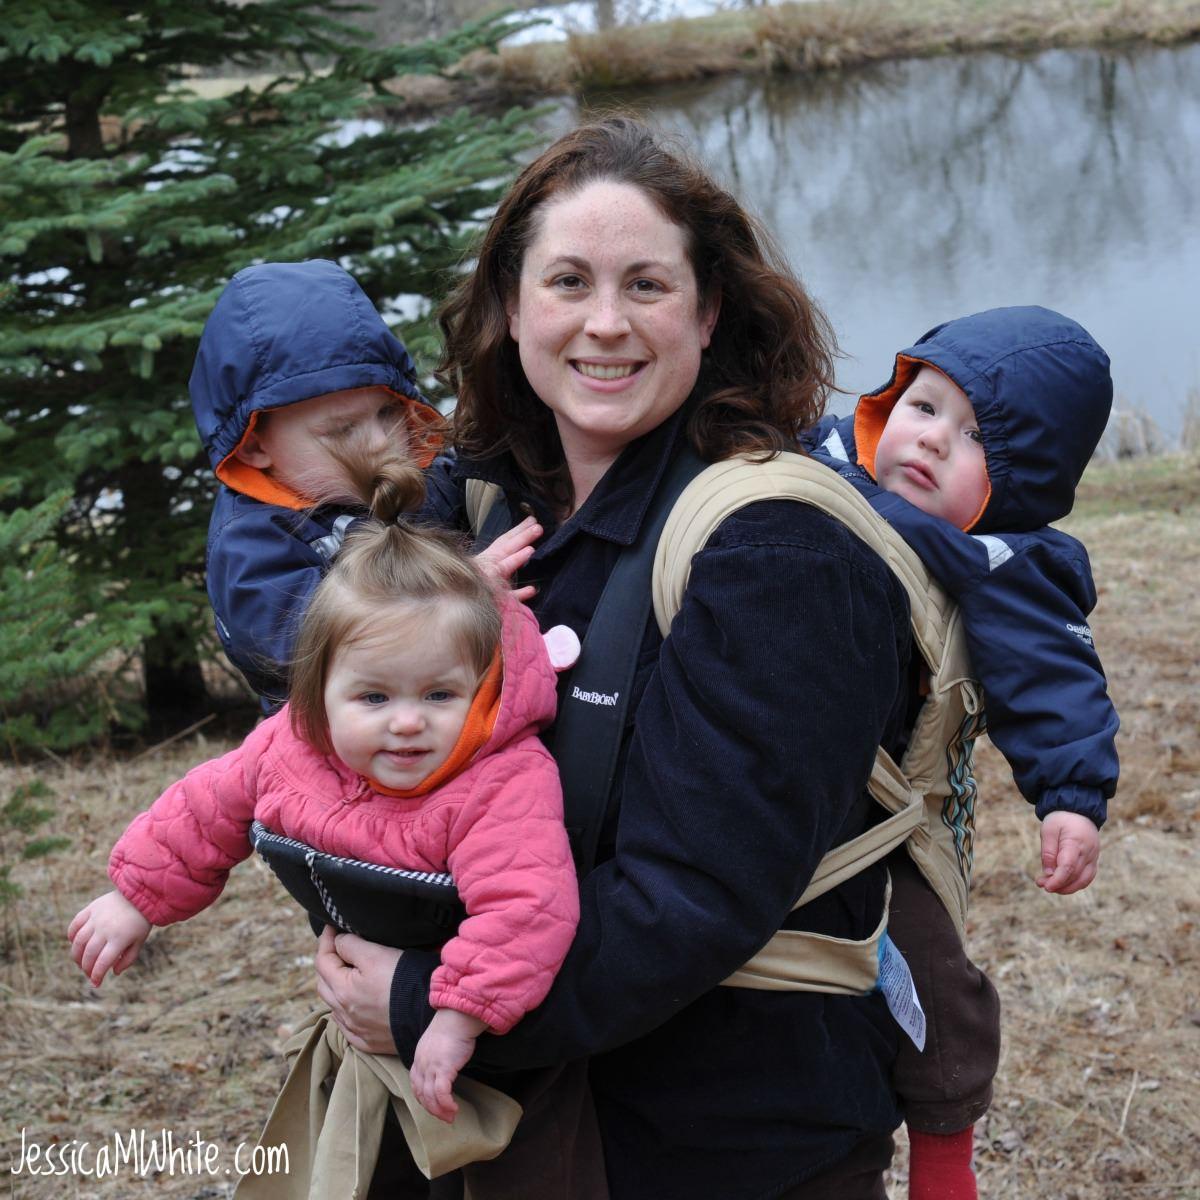 Jessica M. White Babywearing Triplets